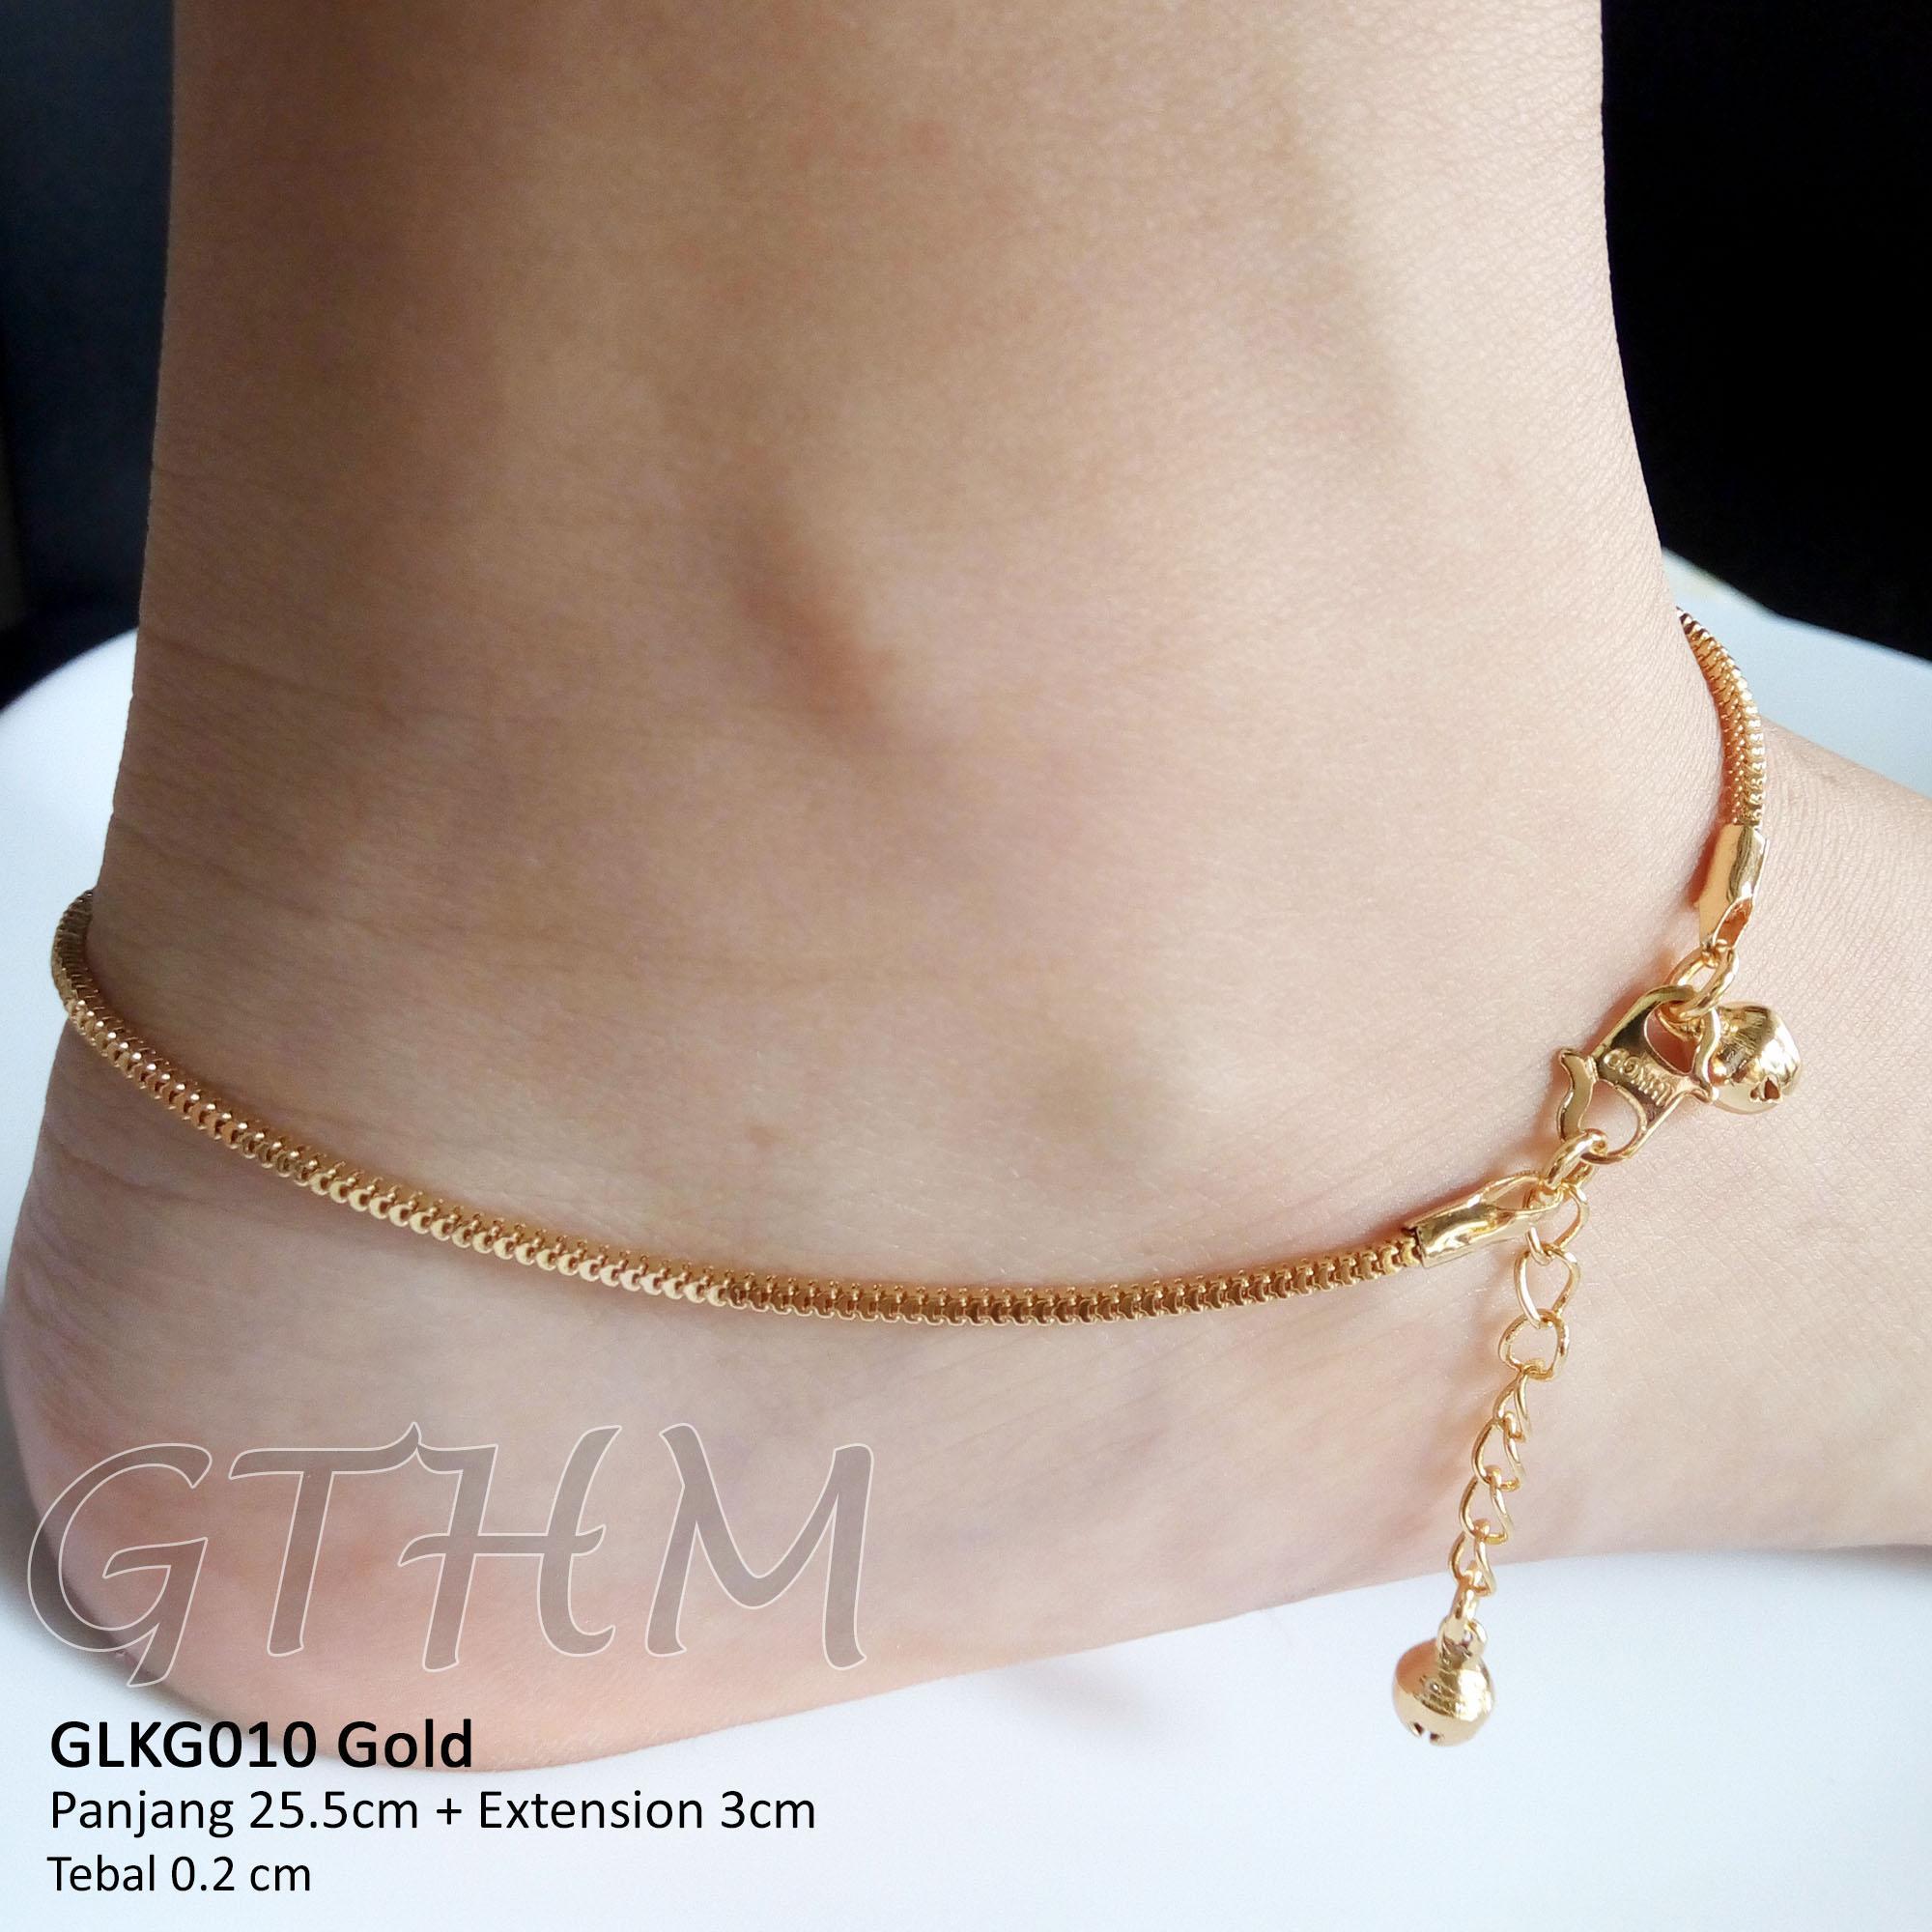 Gelang Kaki Milano Gold Perhiasan Fashion Import Kualitas Premium Titanium Elegan Glkg010 Gthm By Grosir_tashermesya.